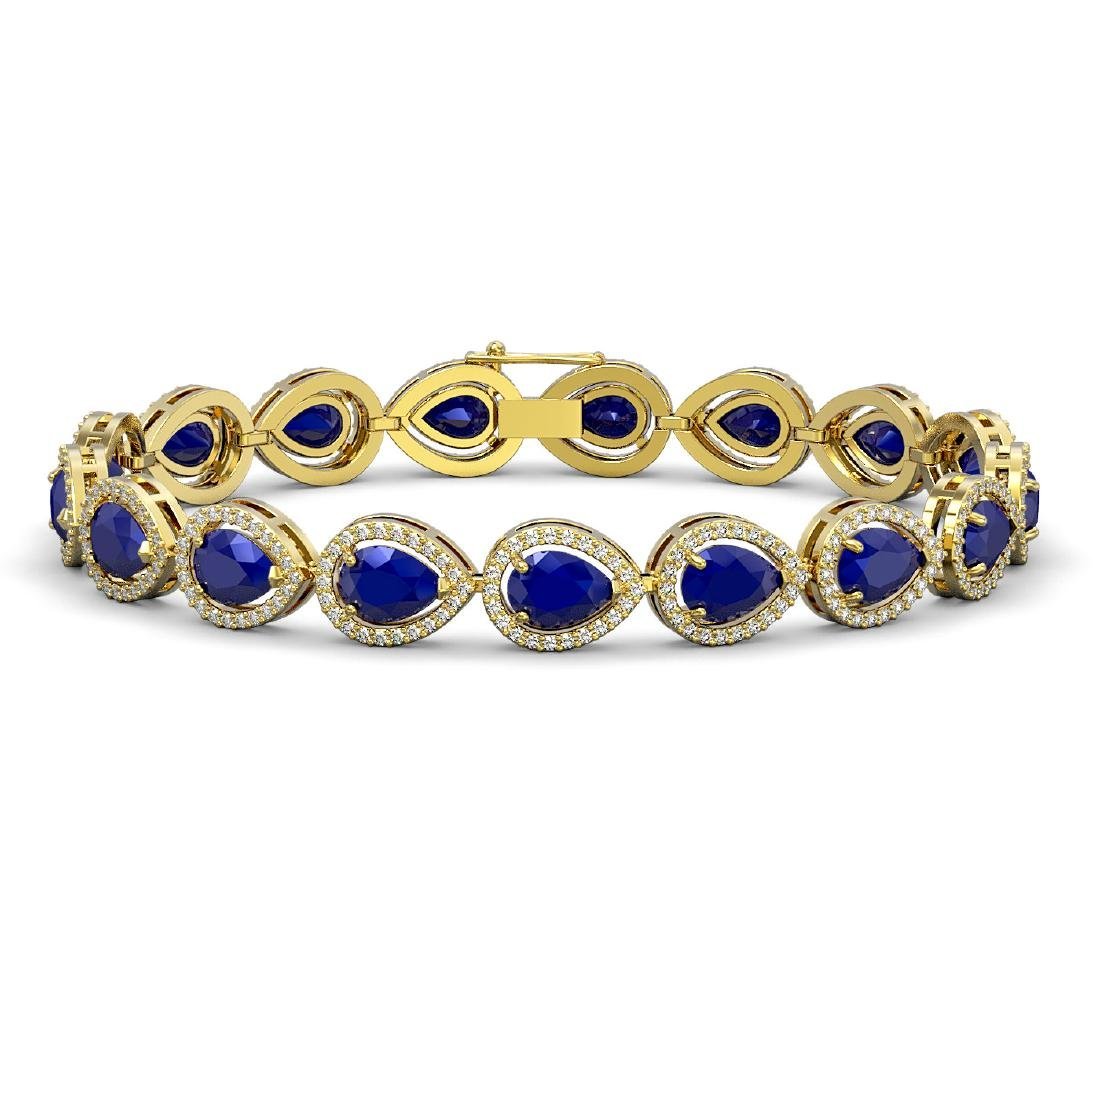 21.69 CTW Sapphire & Diamond Halo Bracelet 10K Yellow